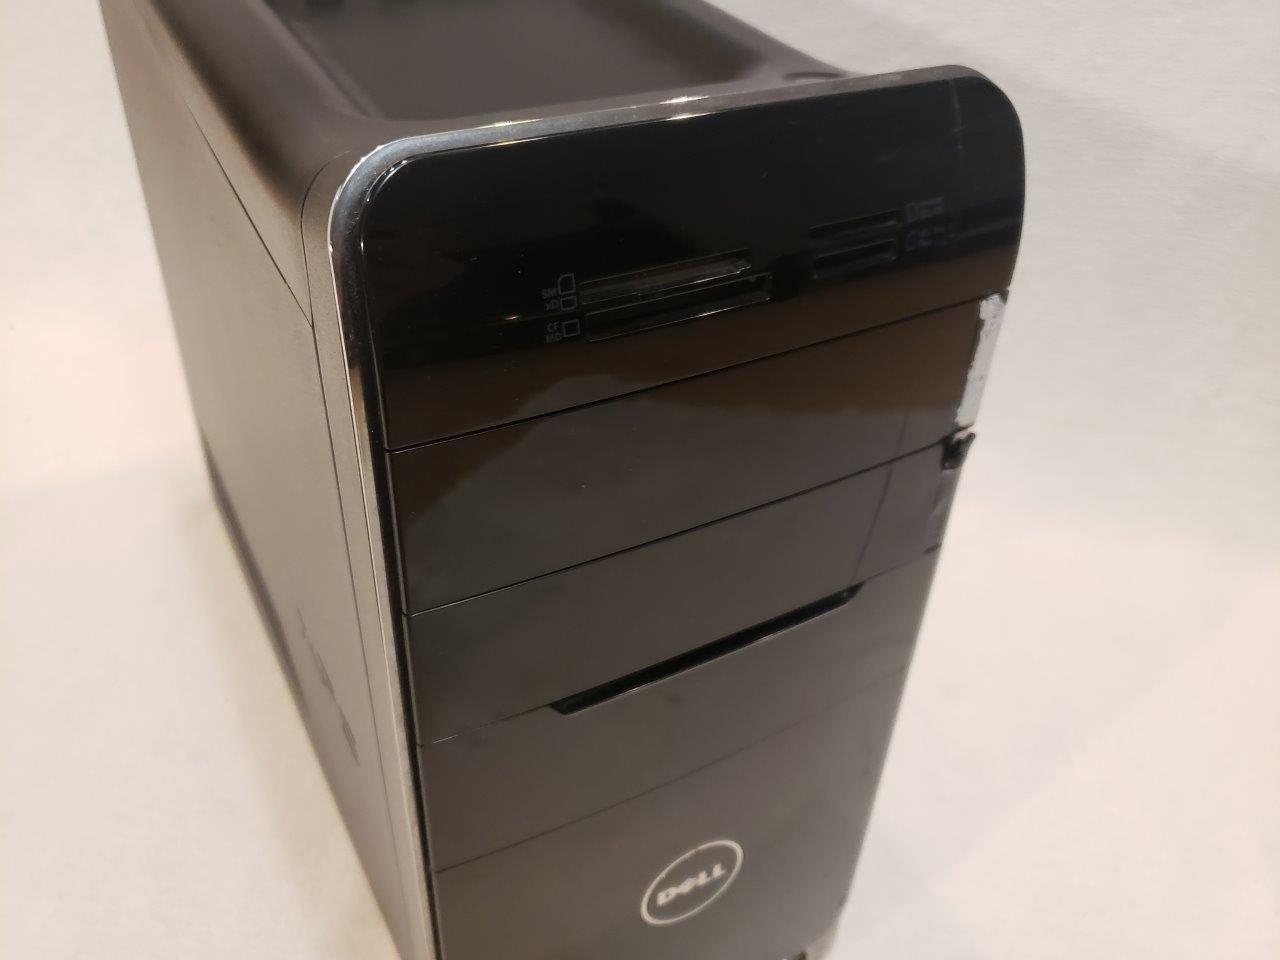 Dell desktop PC Intel i7-2600 3.4 GHz 4 GB RAM 250 GB HDD Windows 7 Pro